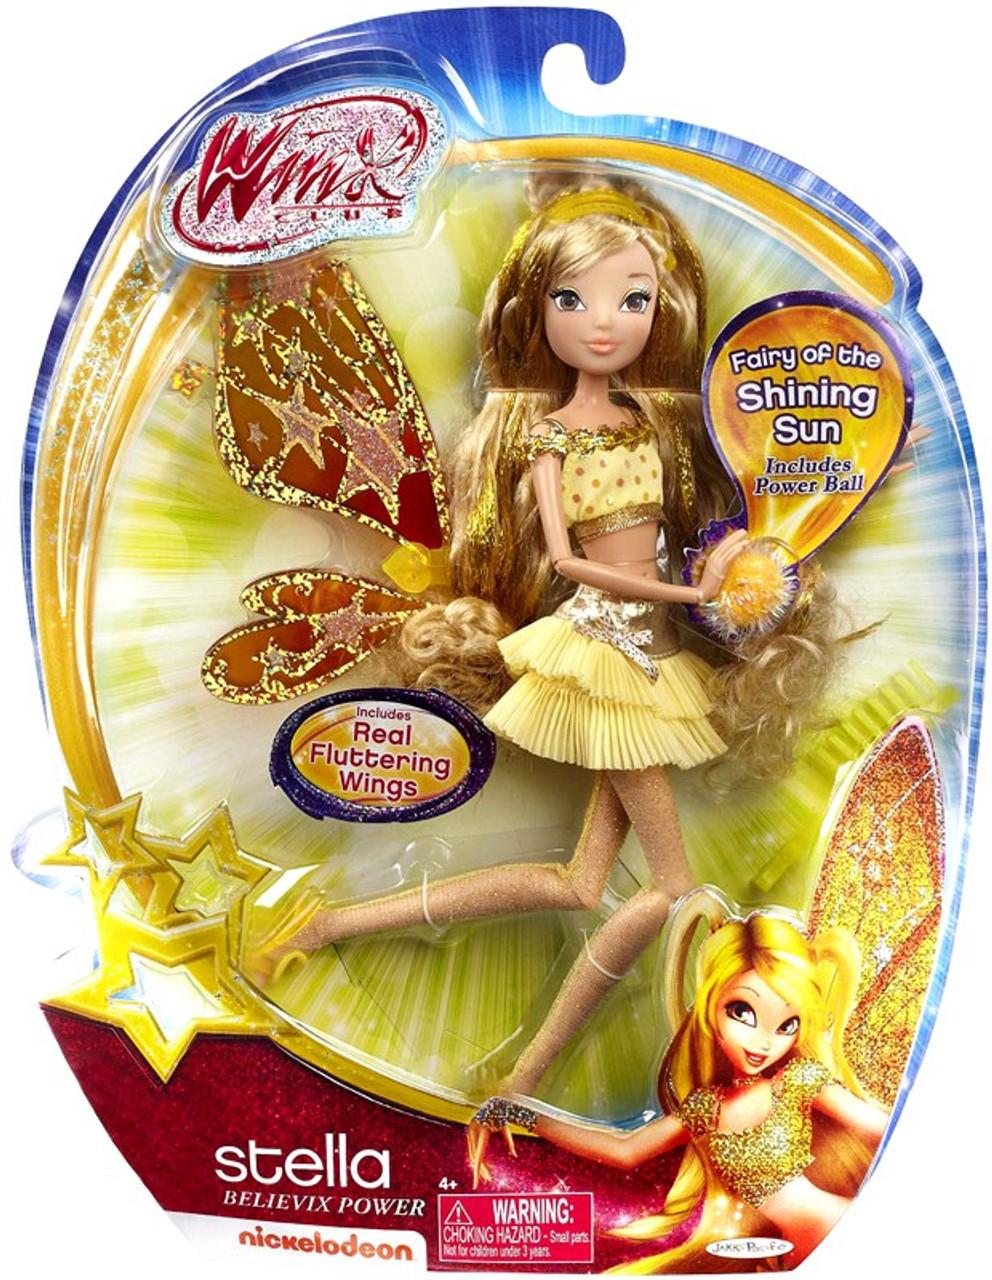 Image Winx Winx Club Bloom Magic 17687067 800 599 Jpg